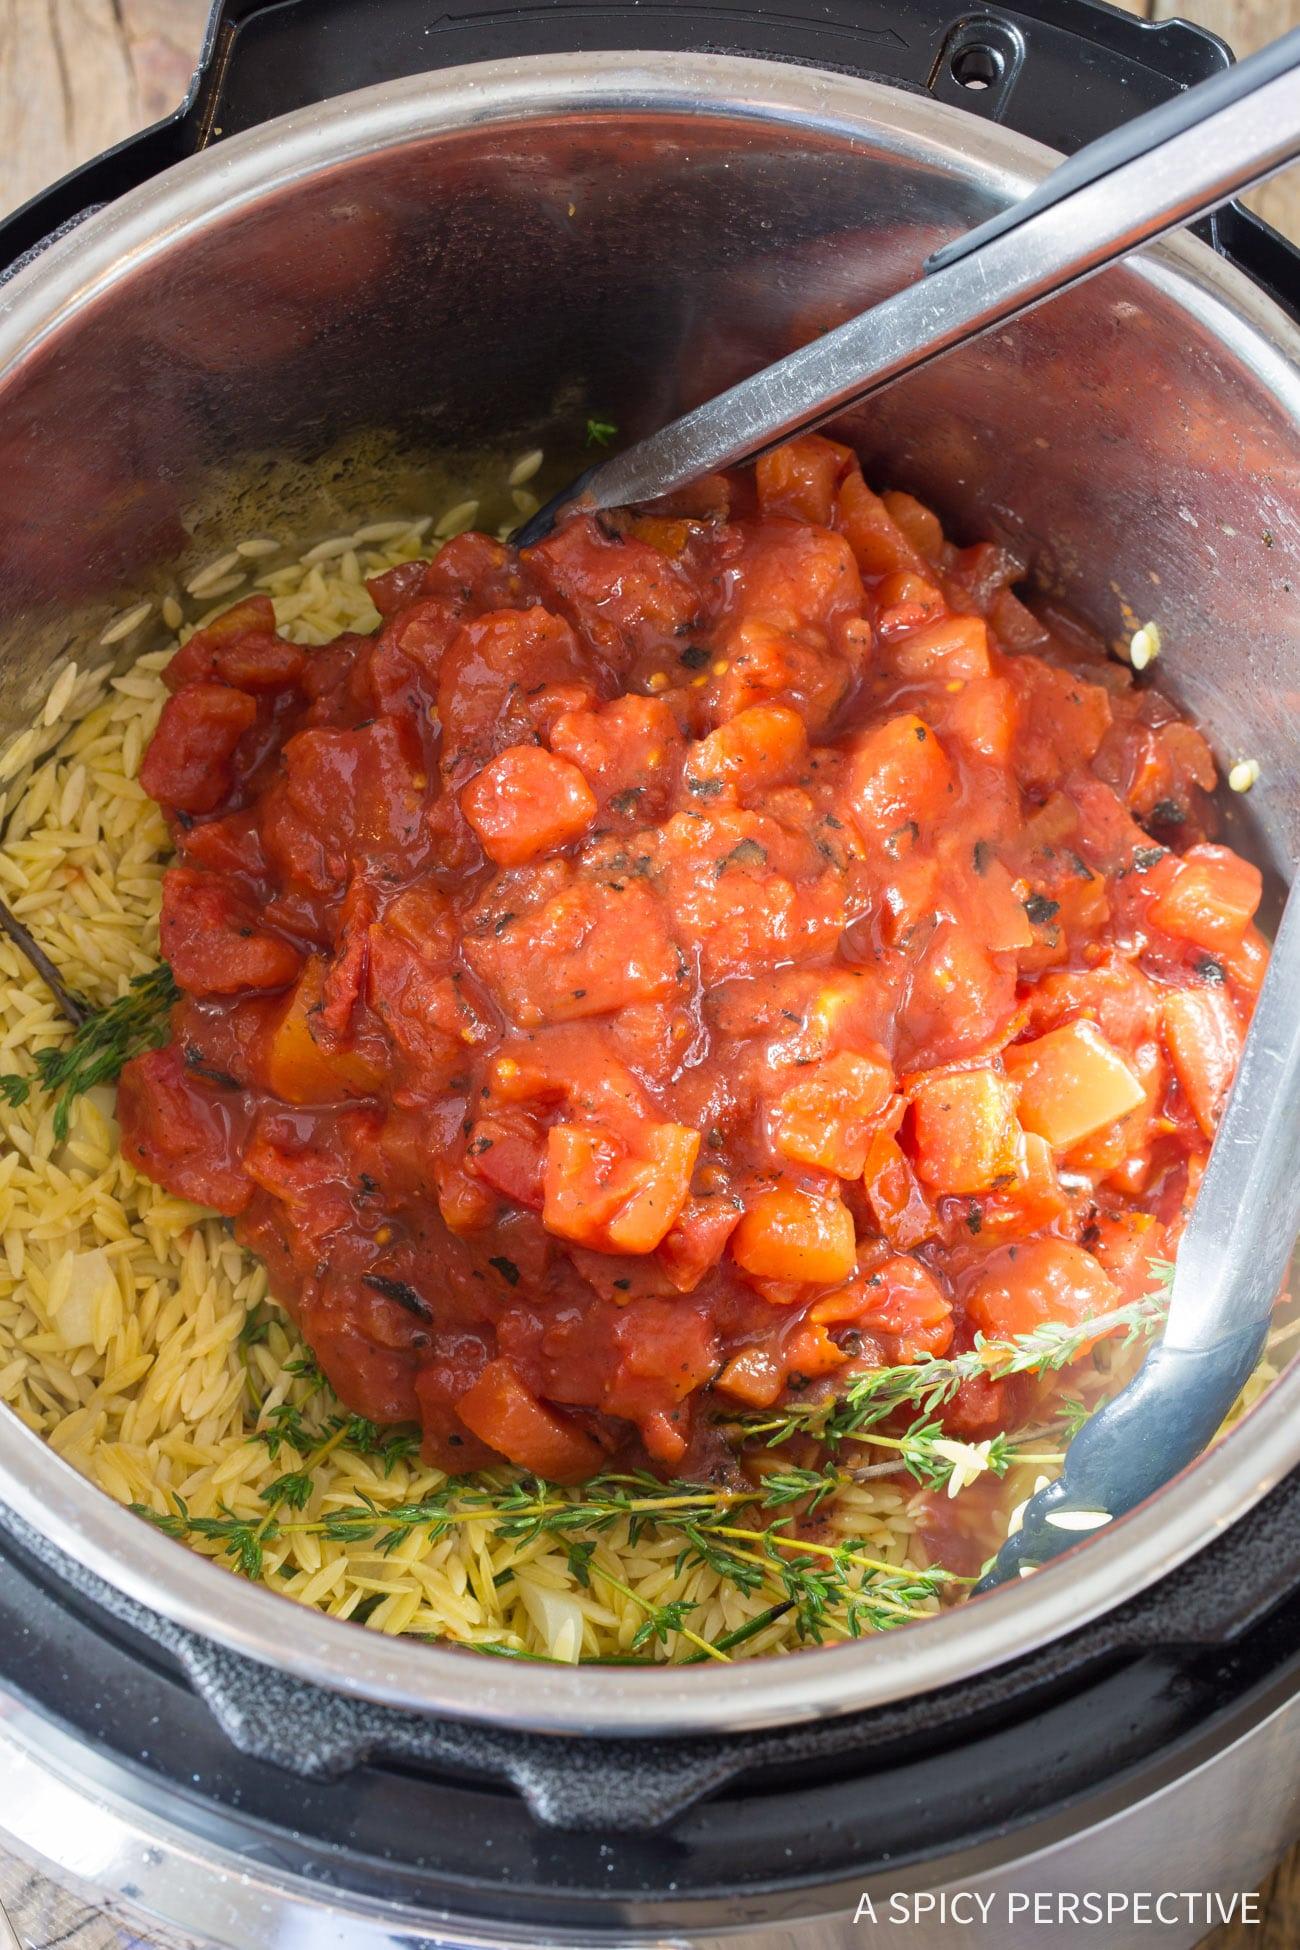 How To: Instant Pot Herb Chicken Orzo Recipe (Pressure Cooker Italian Pasta)